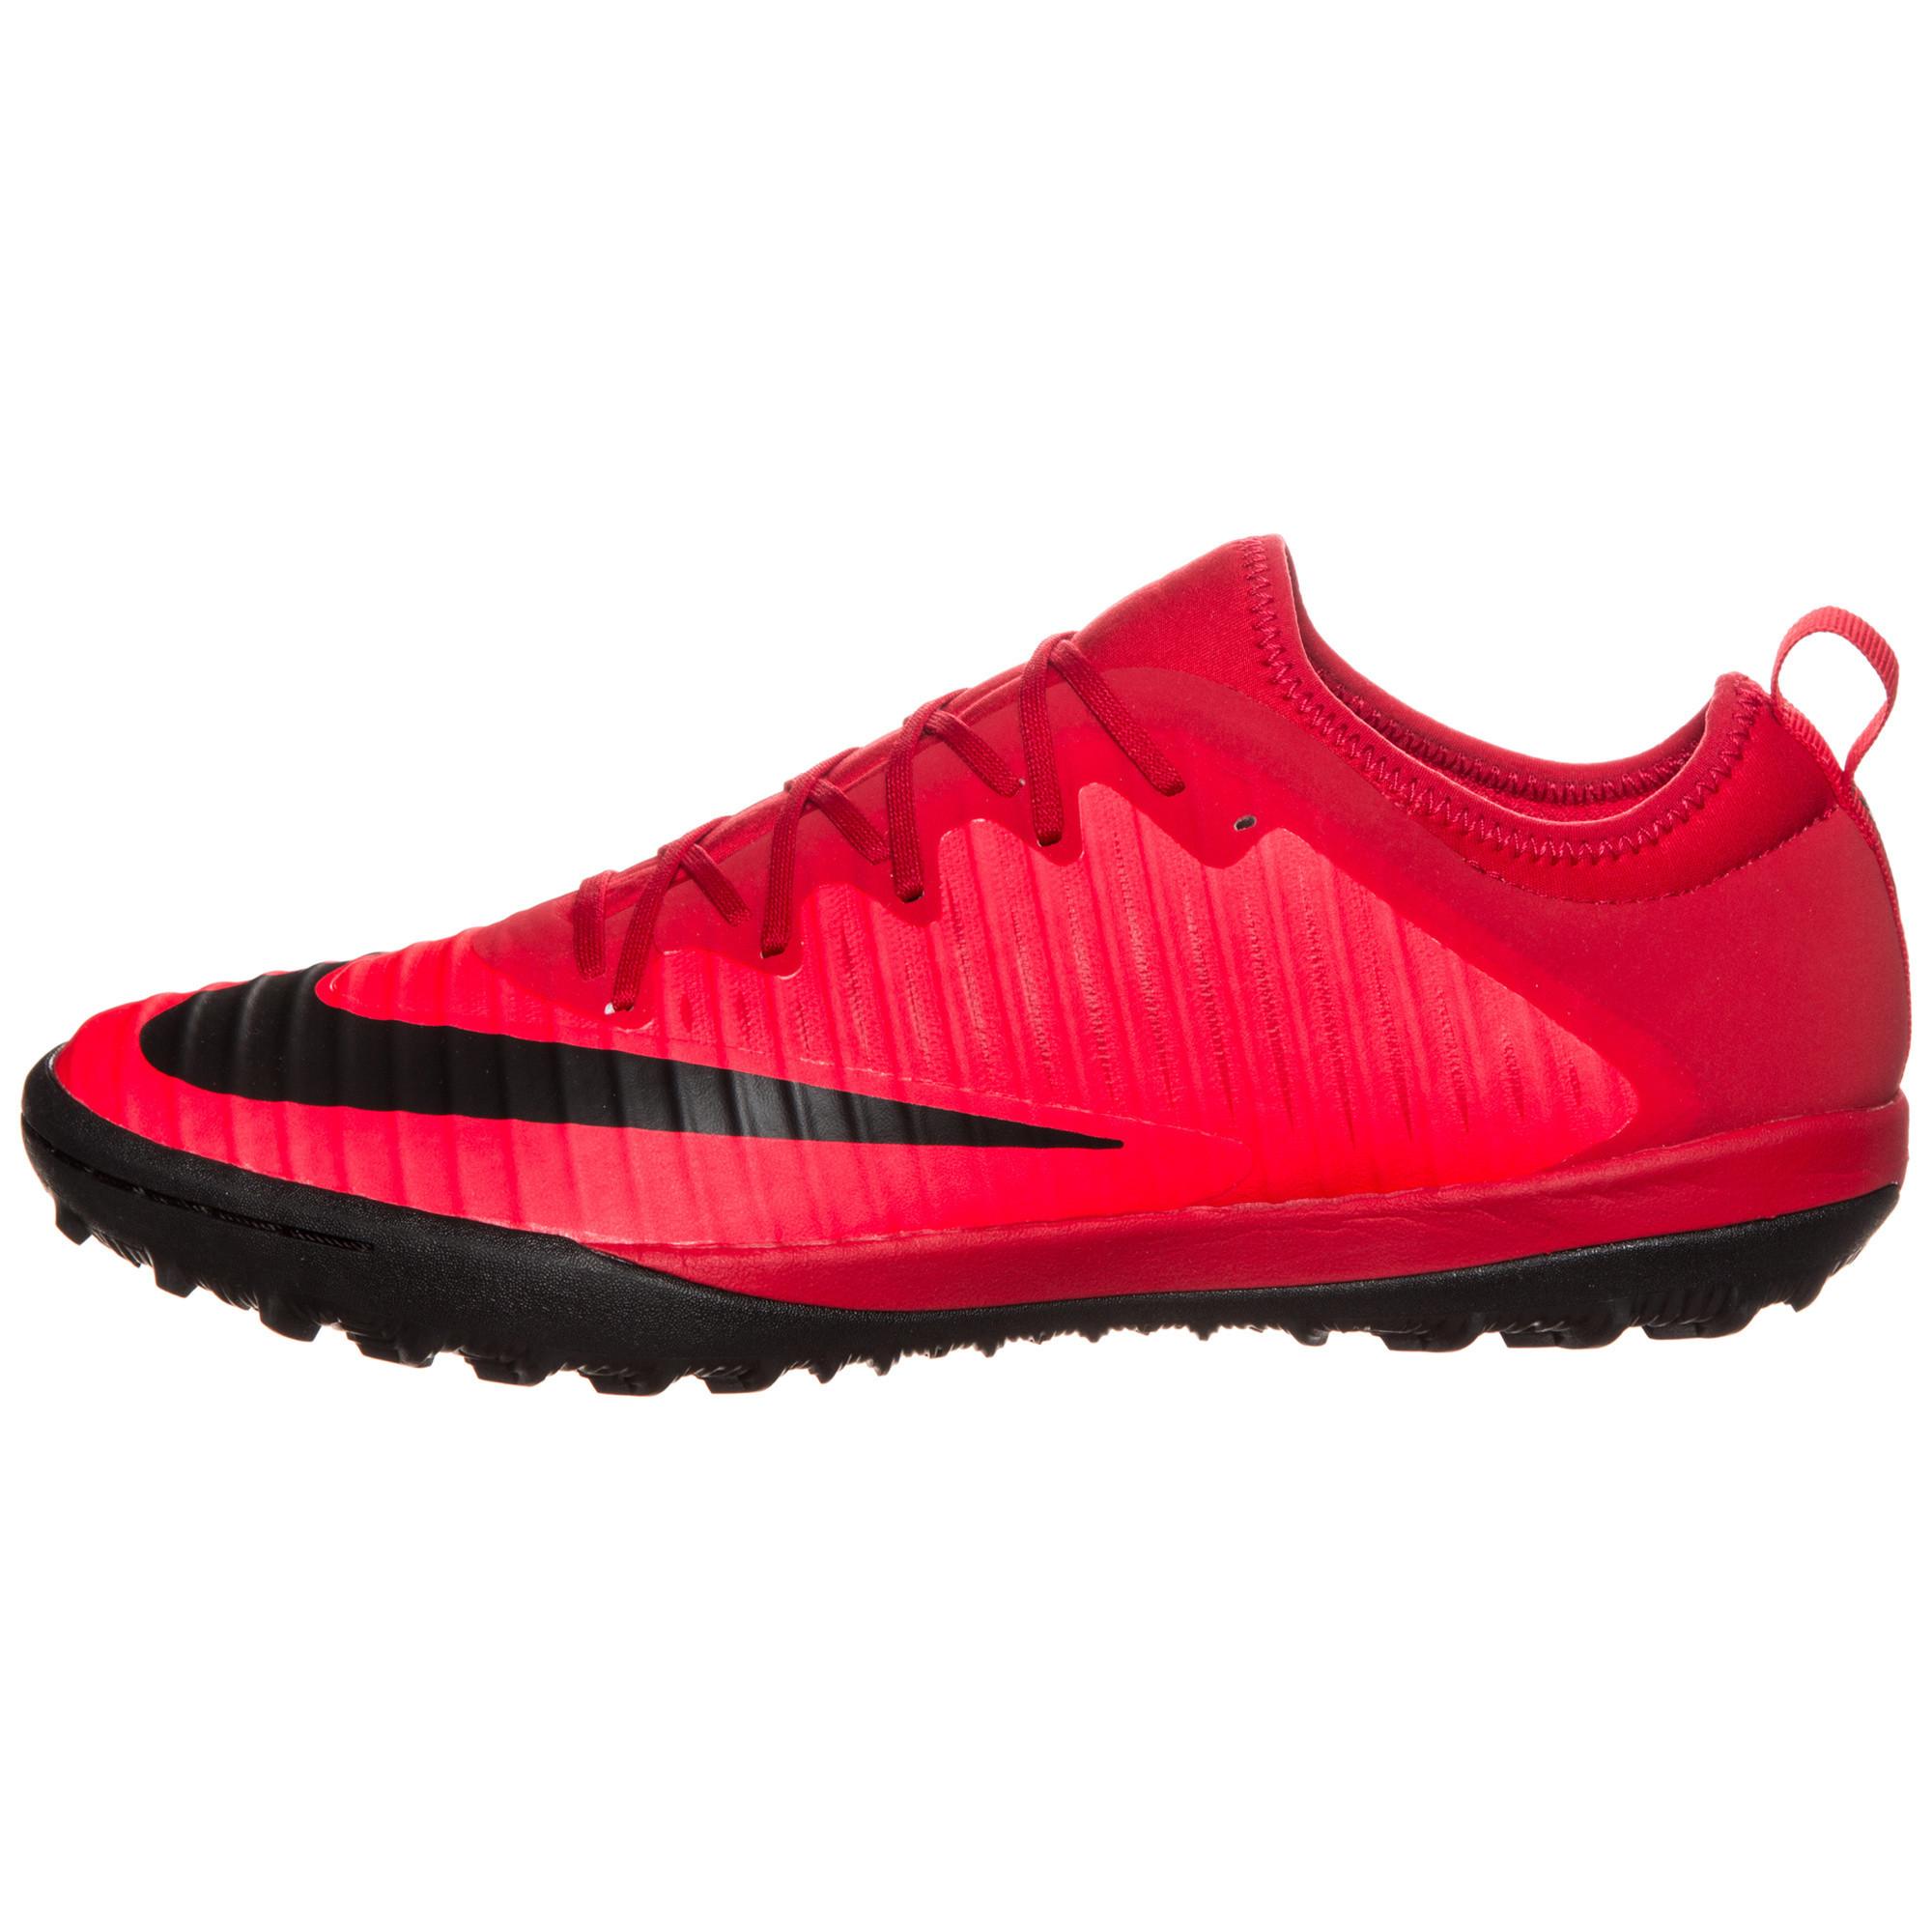 Nike mercurialx finale ii tf nike marques for Univers du jardin maule 78